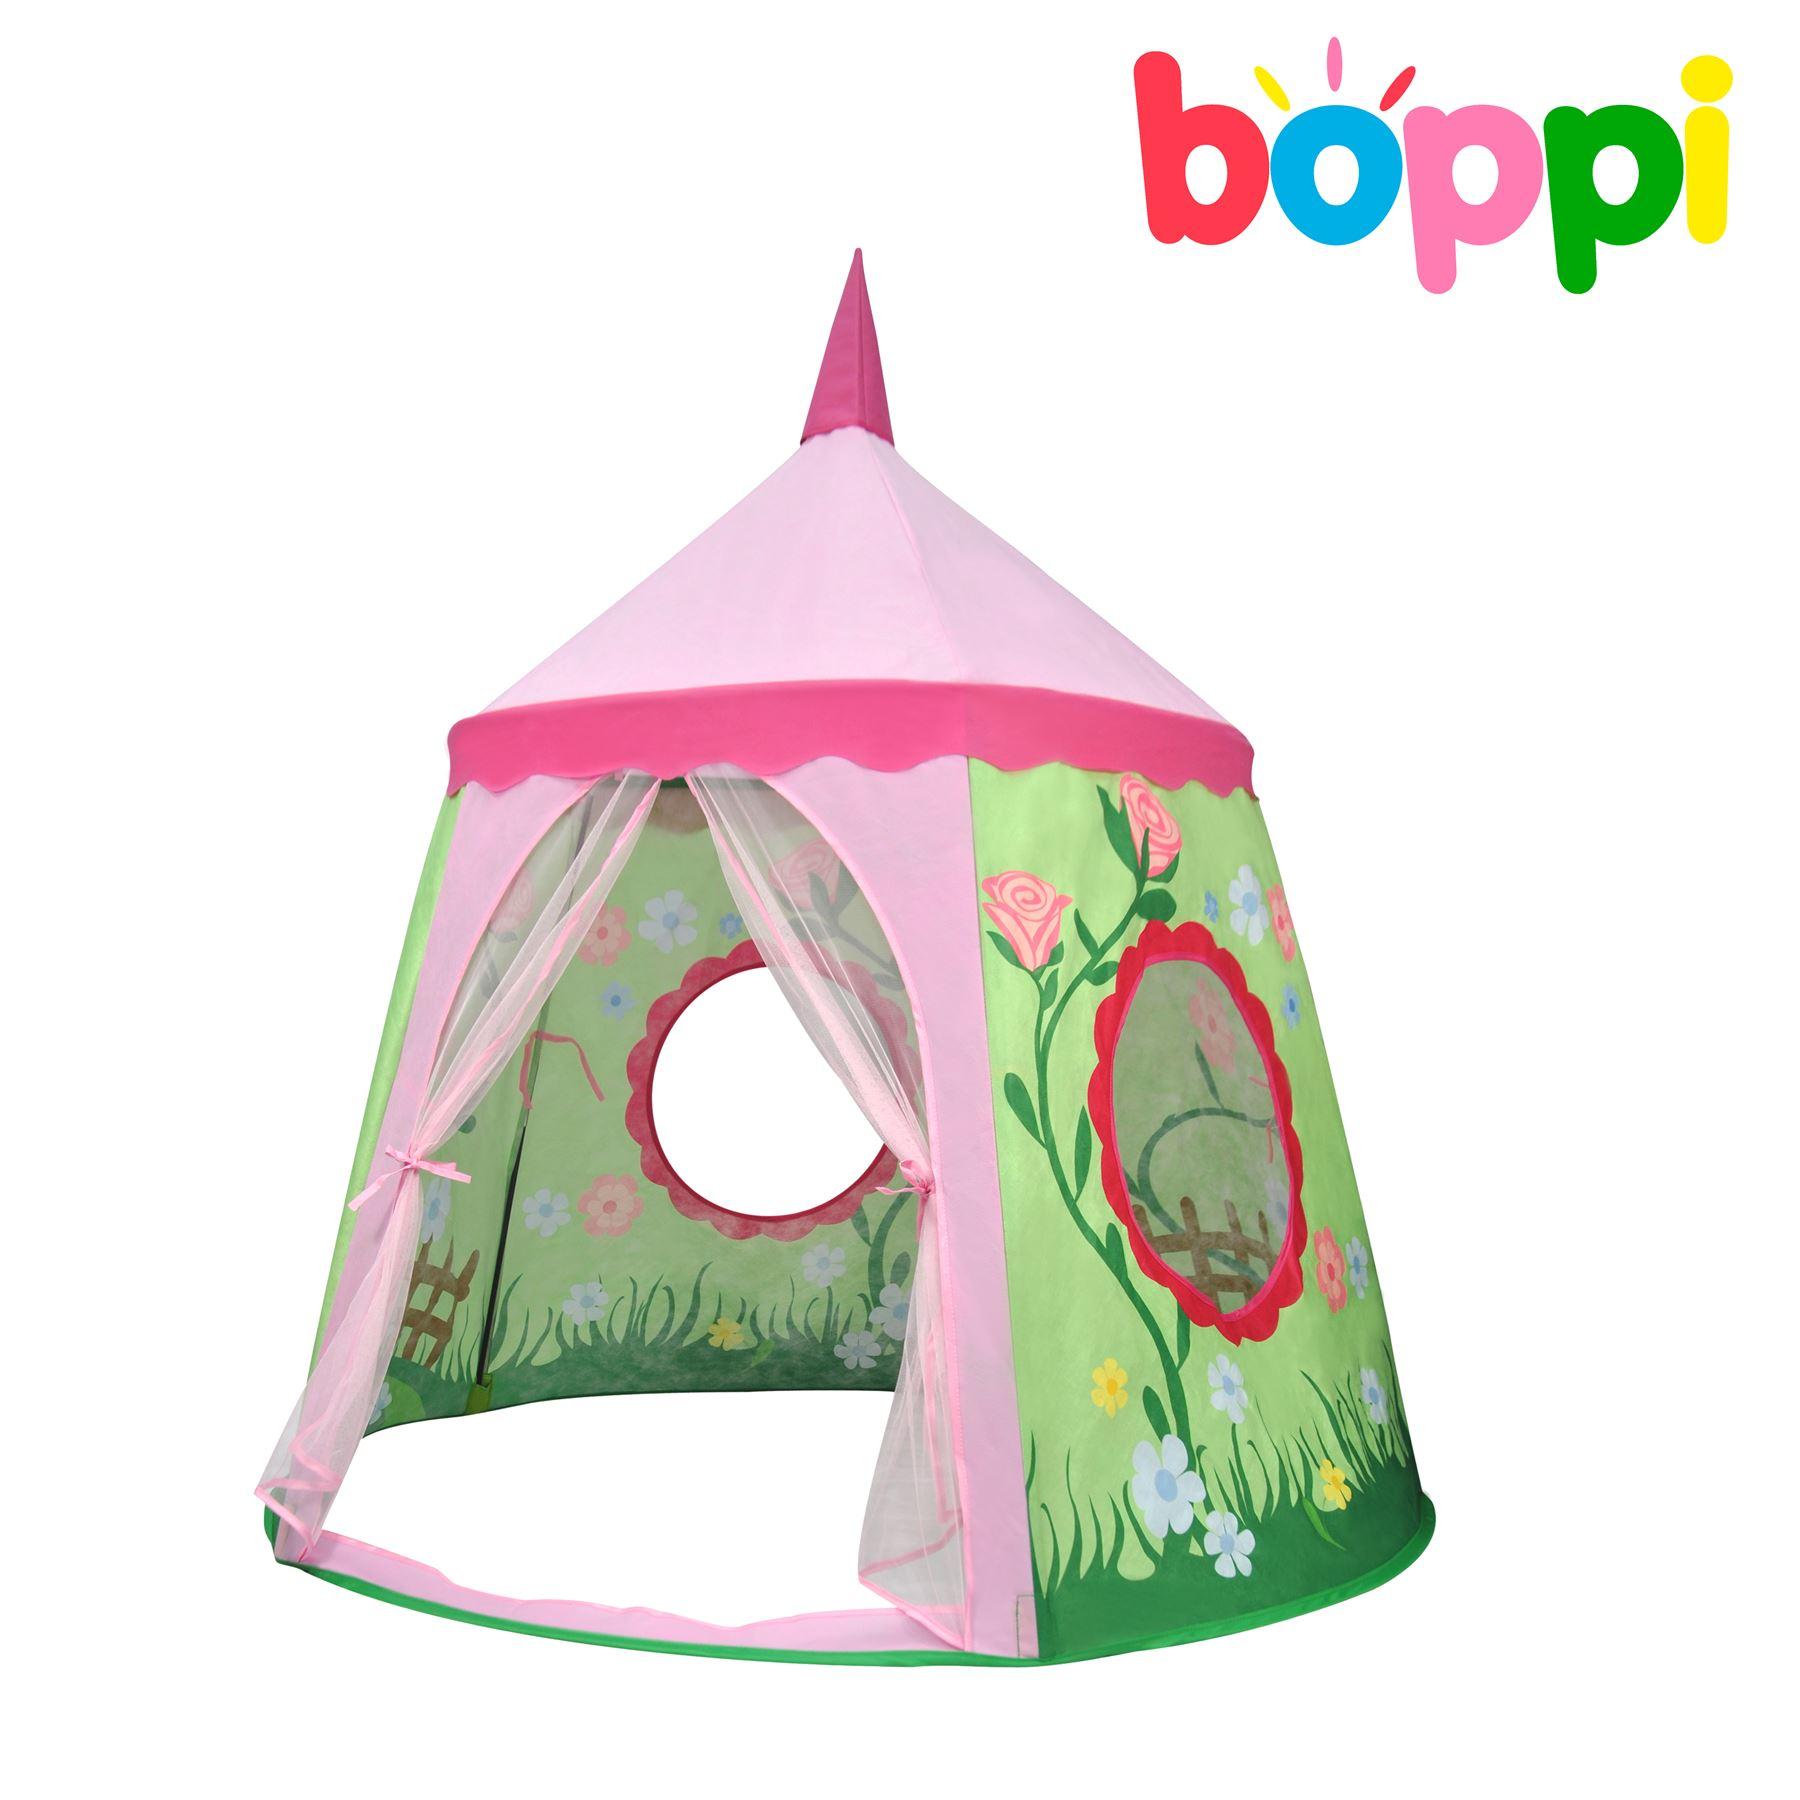 childrens kids canvas playtent pink garden outdoor indoor pop up tent playhouse ebay. Black Bedroom Furniture Sets. Home Design Ideas